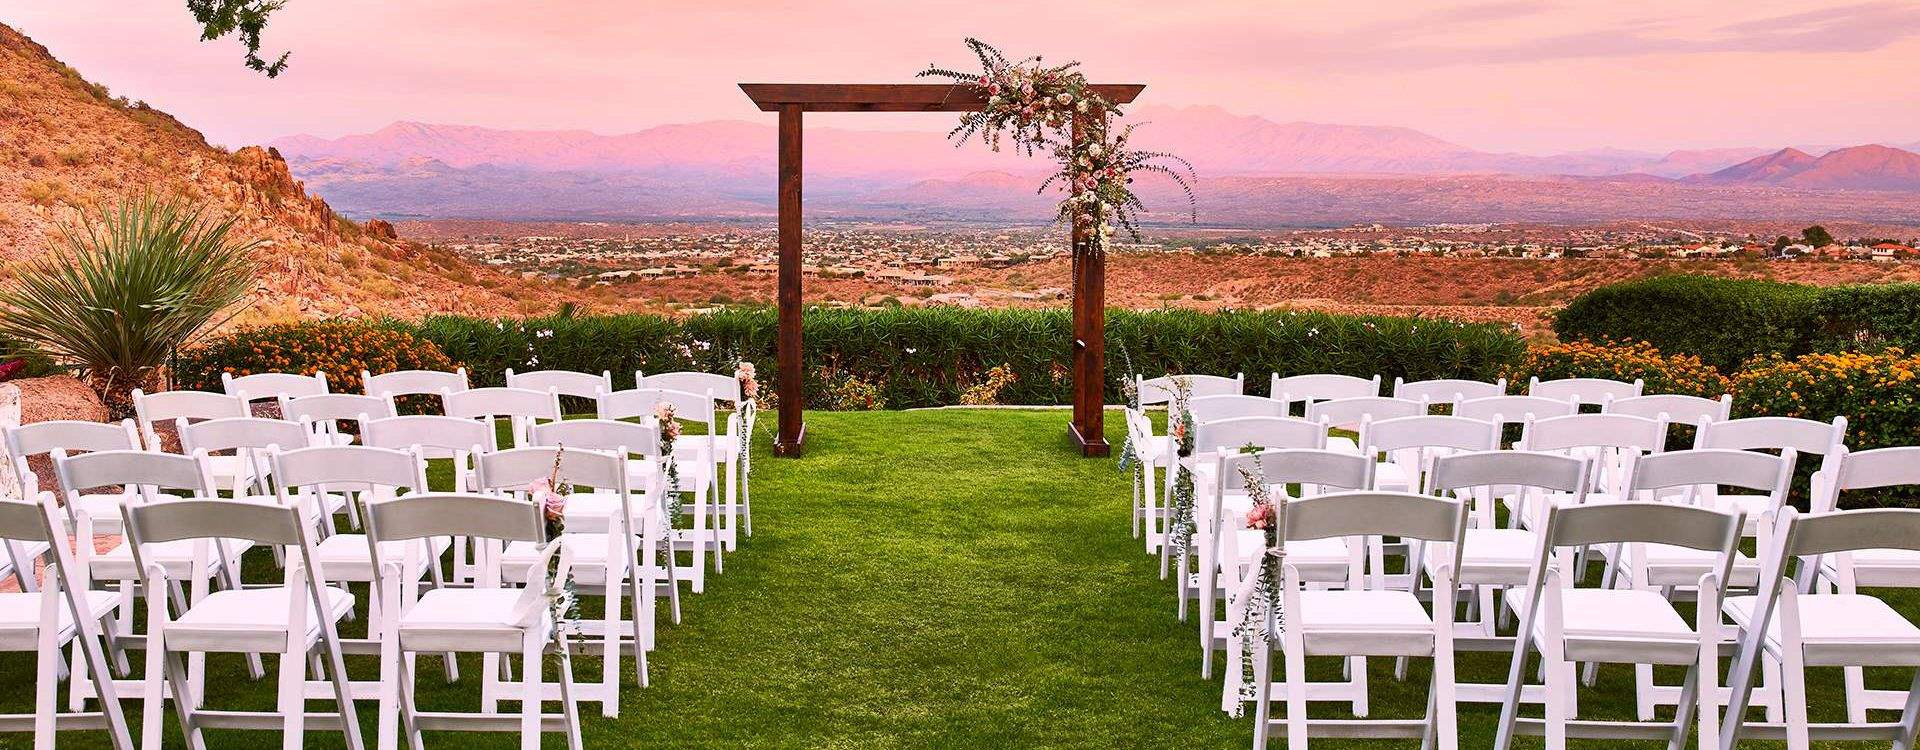 Venues of Hotel Scottsdale